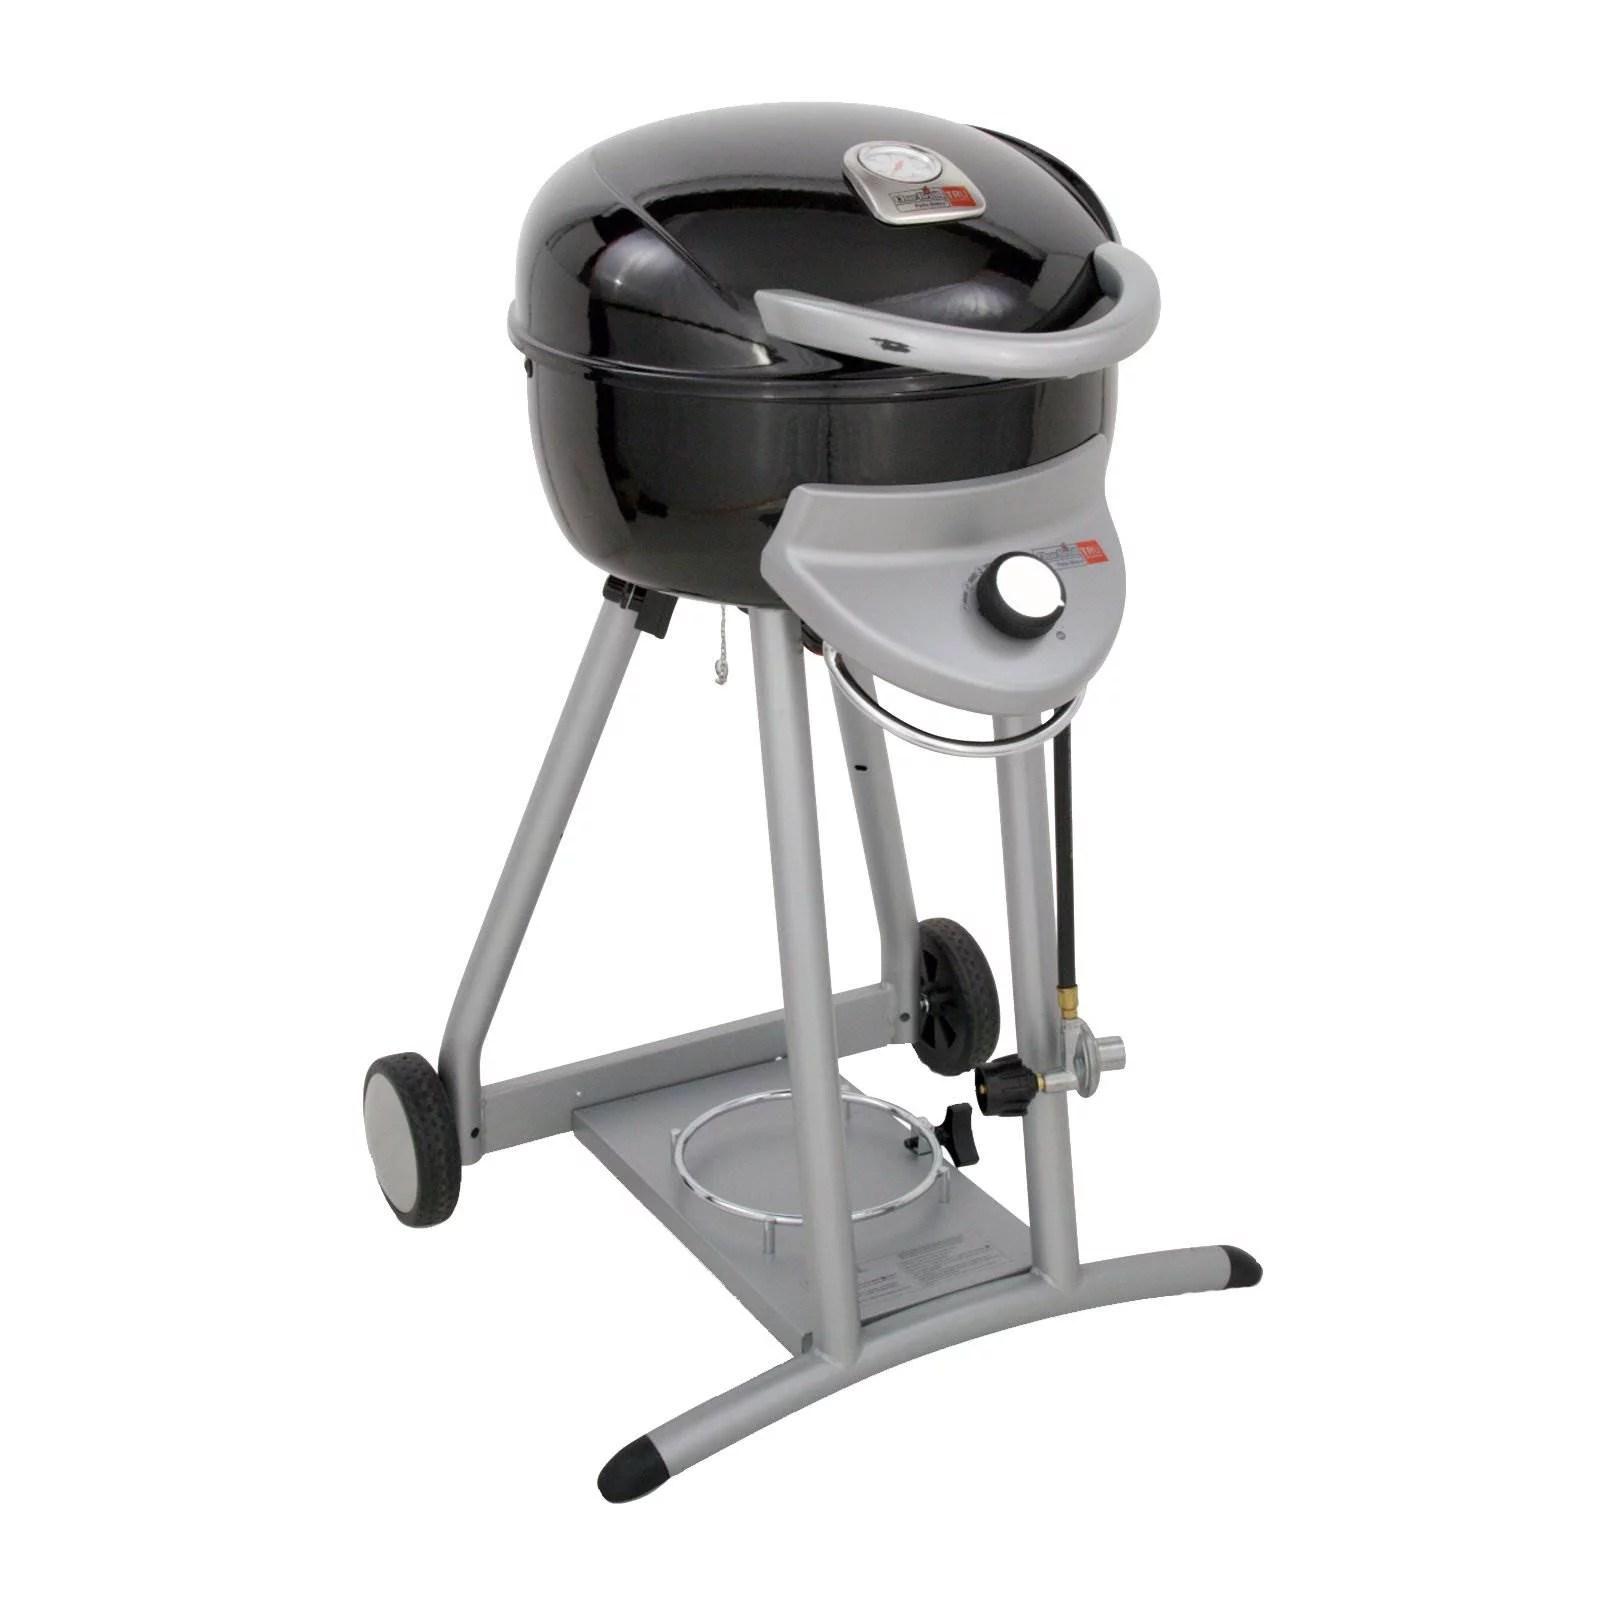 char broil patio bistro electric grill black